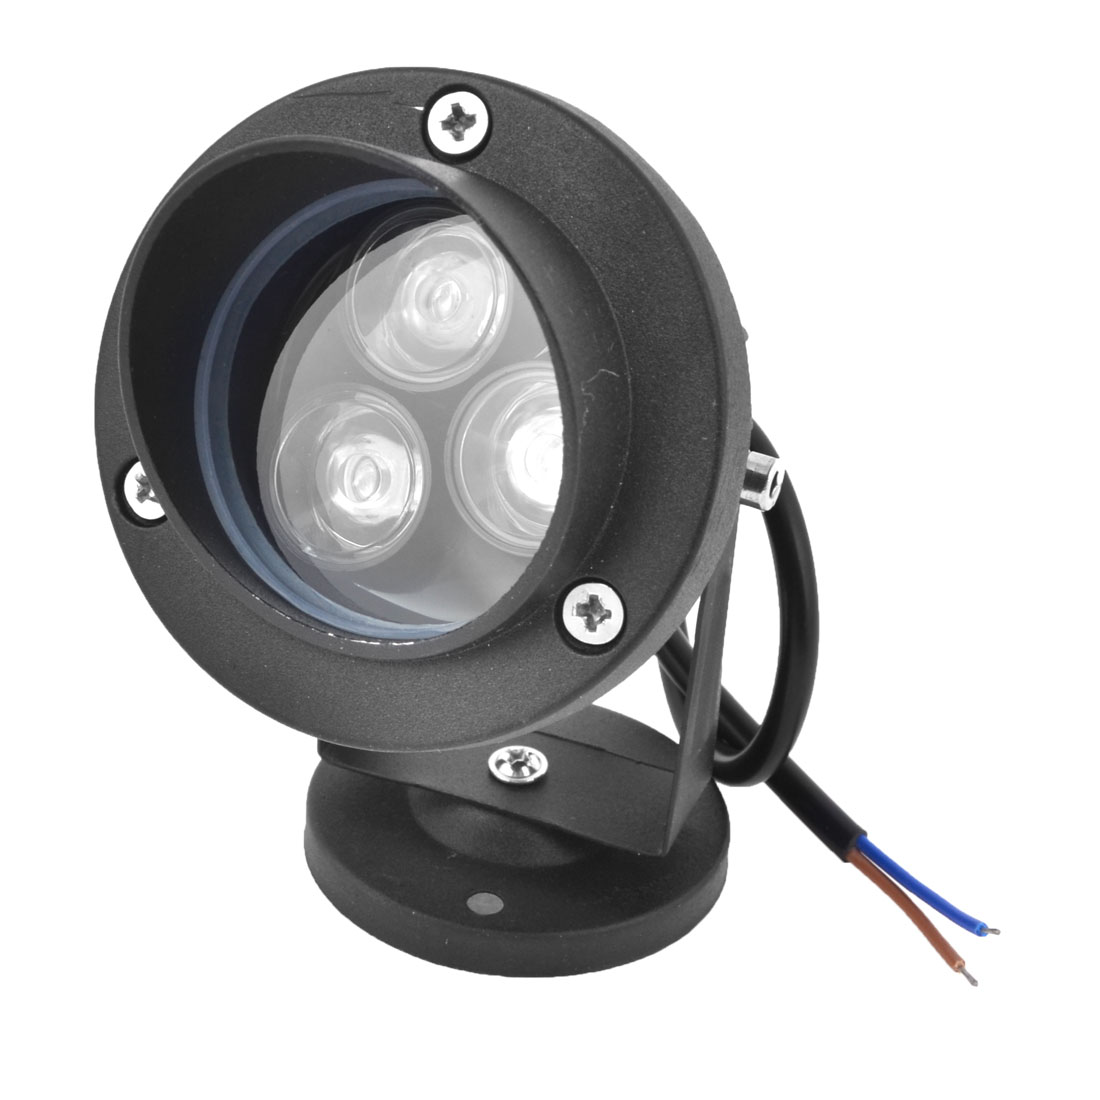 12V 6W Blue 3-LEDs Light Outdoor Yard Lawn Lamp Spotlight